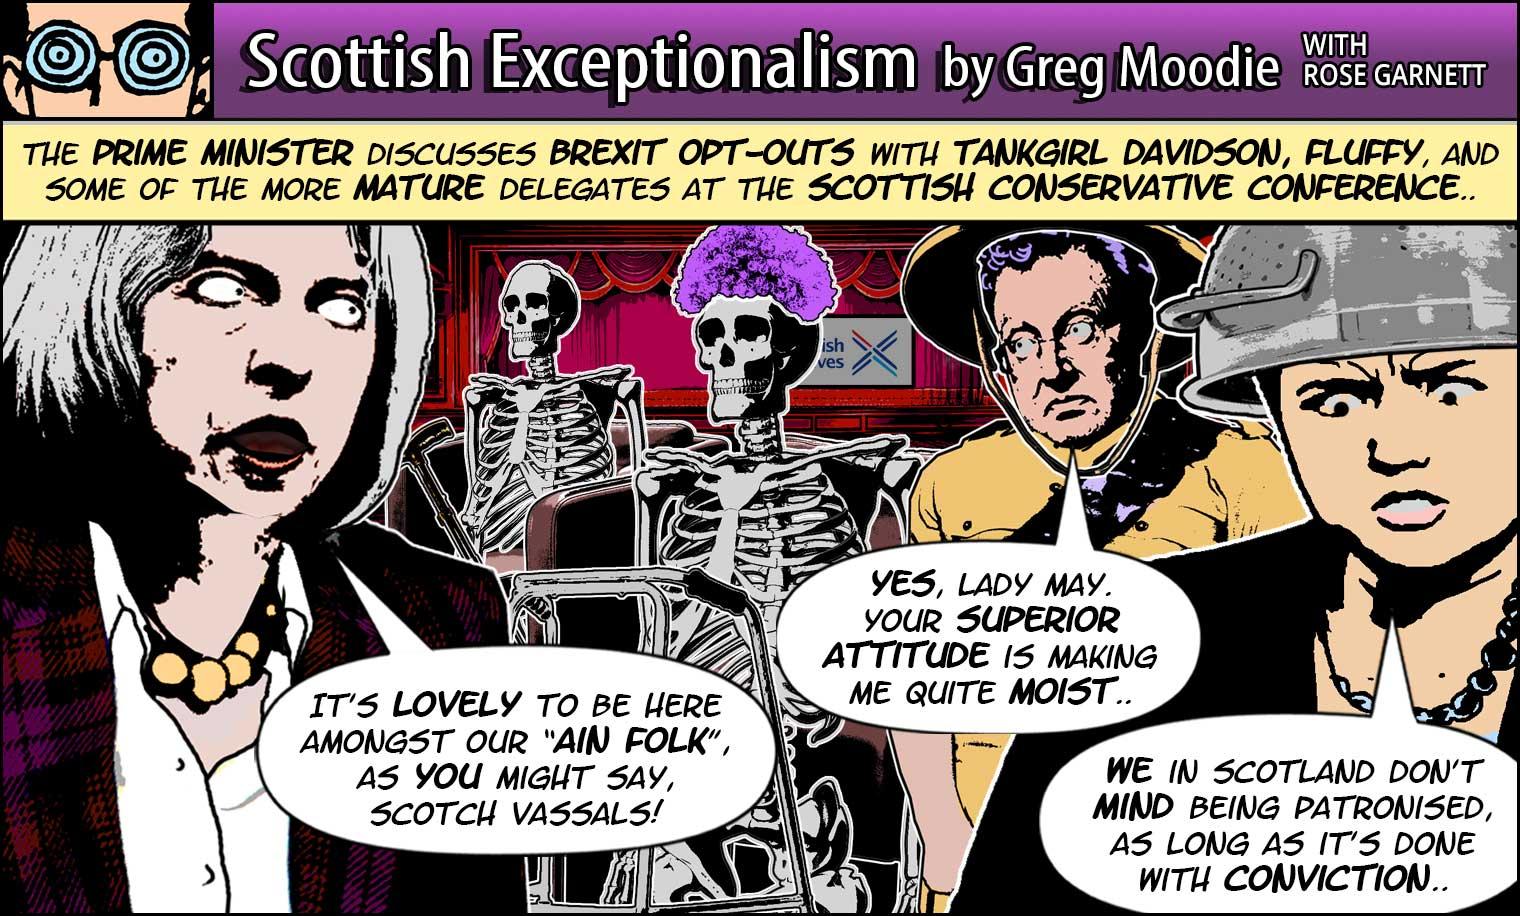 Scottish Exceptionalism